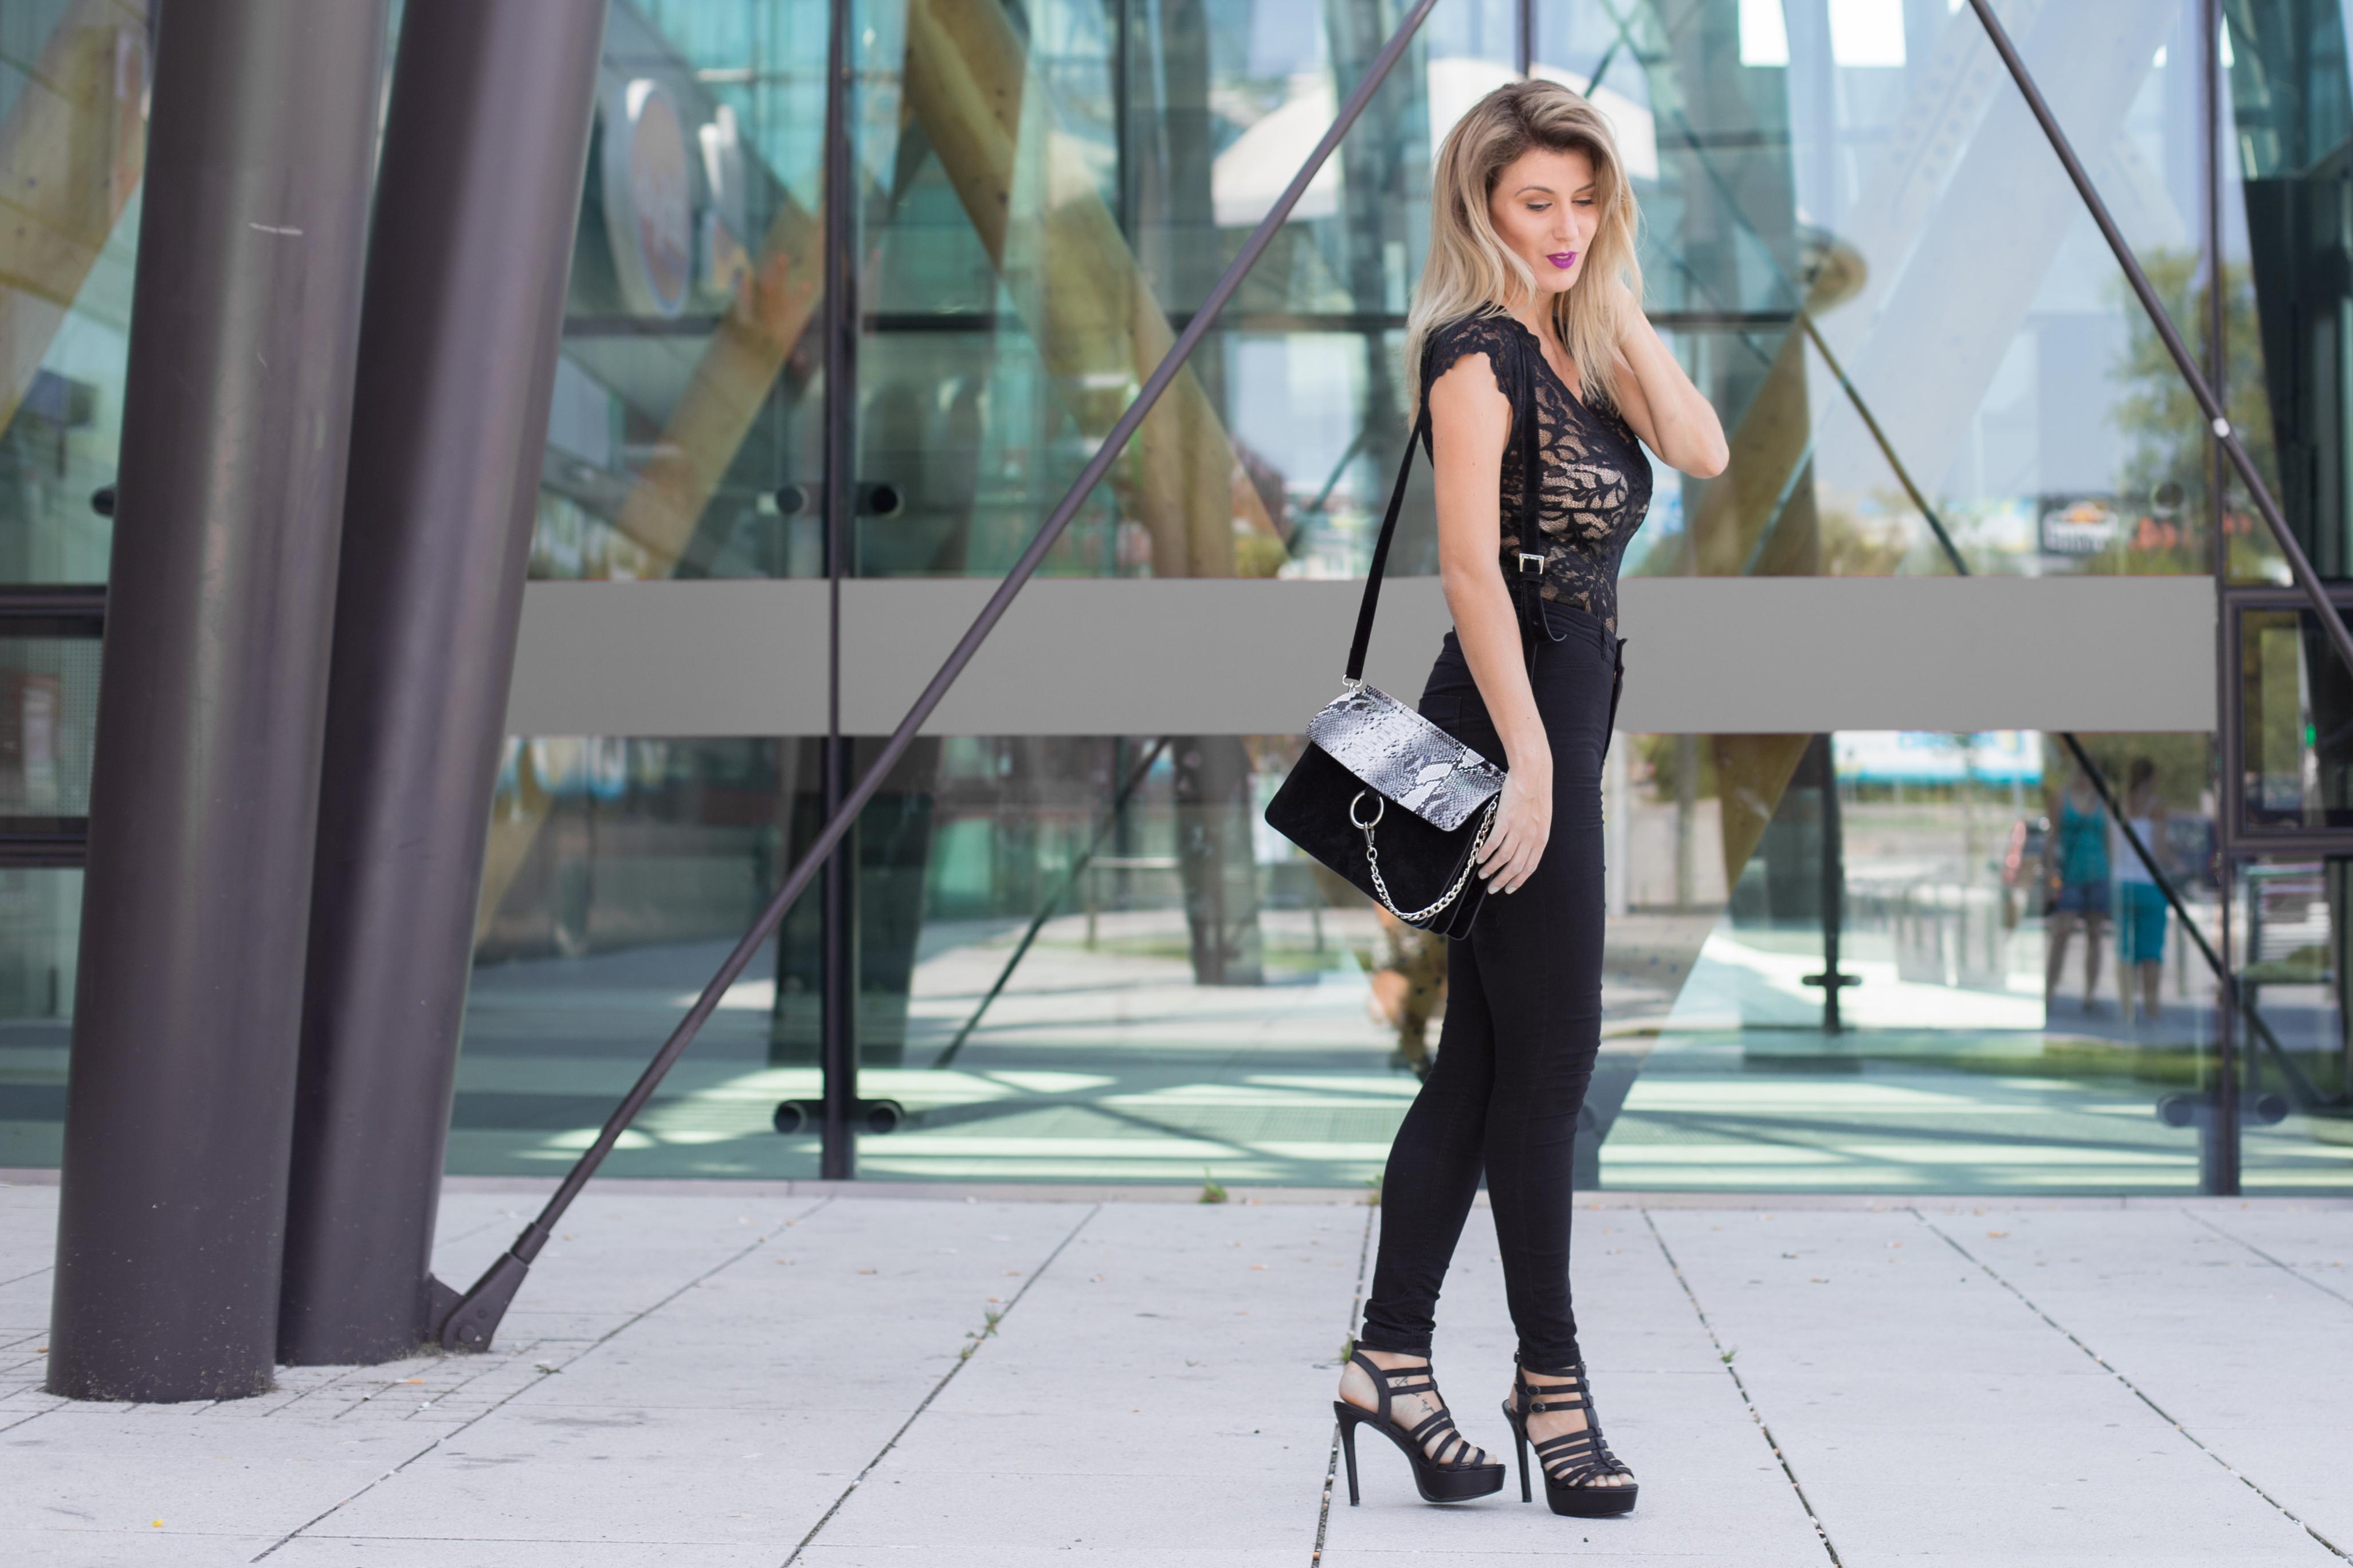 Foto_by_Nadja_Nemetz_Wien_Outfit_Fashion_Mode_Modeblogger_Blogger_2